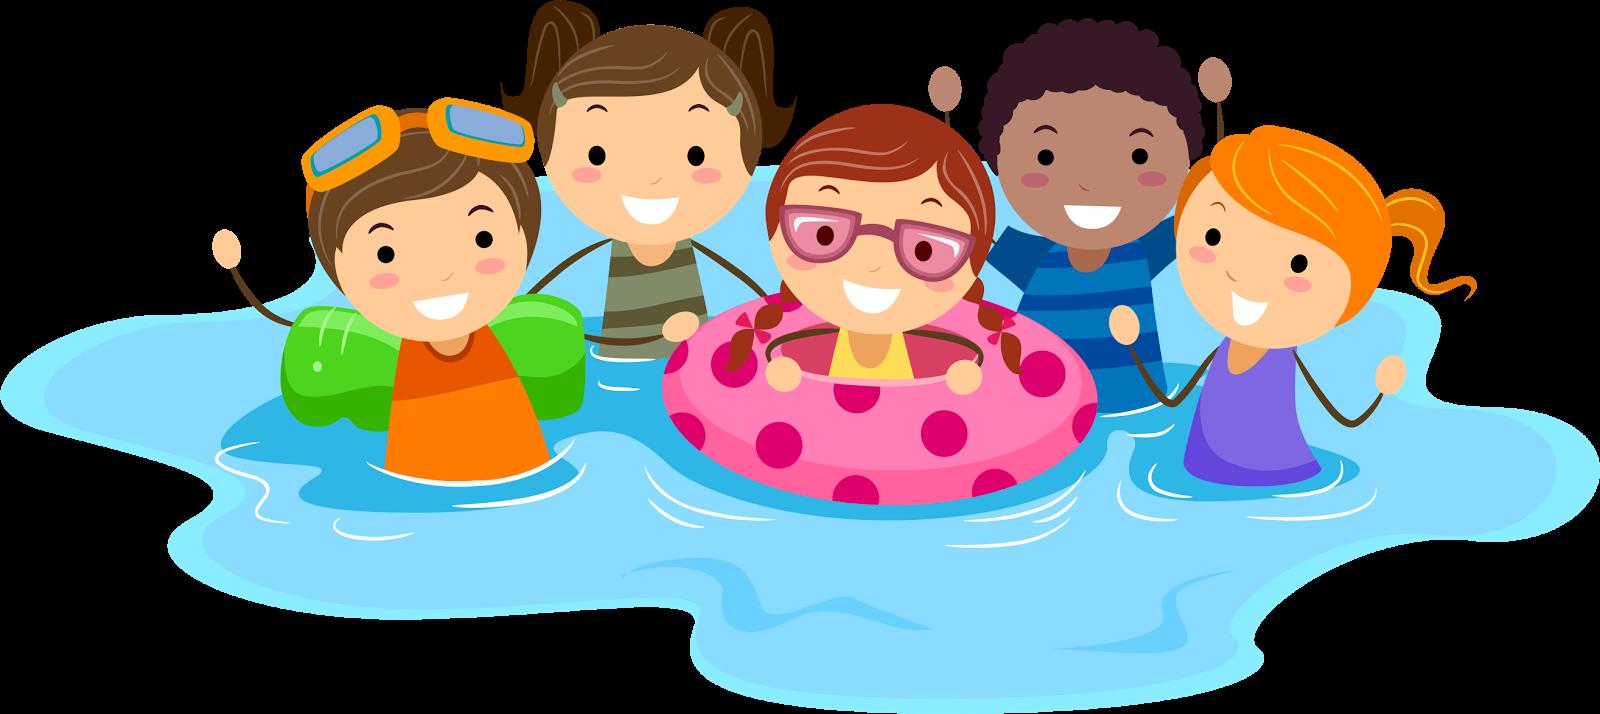 Kid clipart swimming pool, Kid swimming pool Transparent.